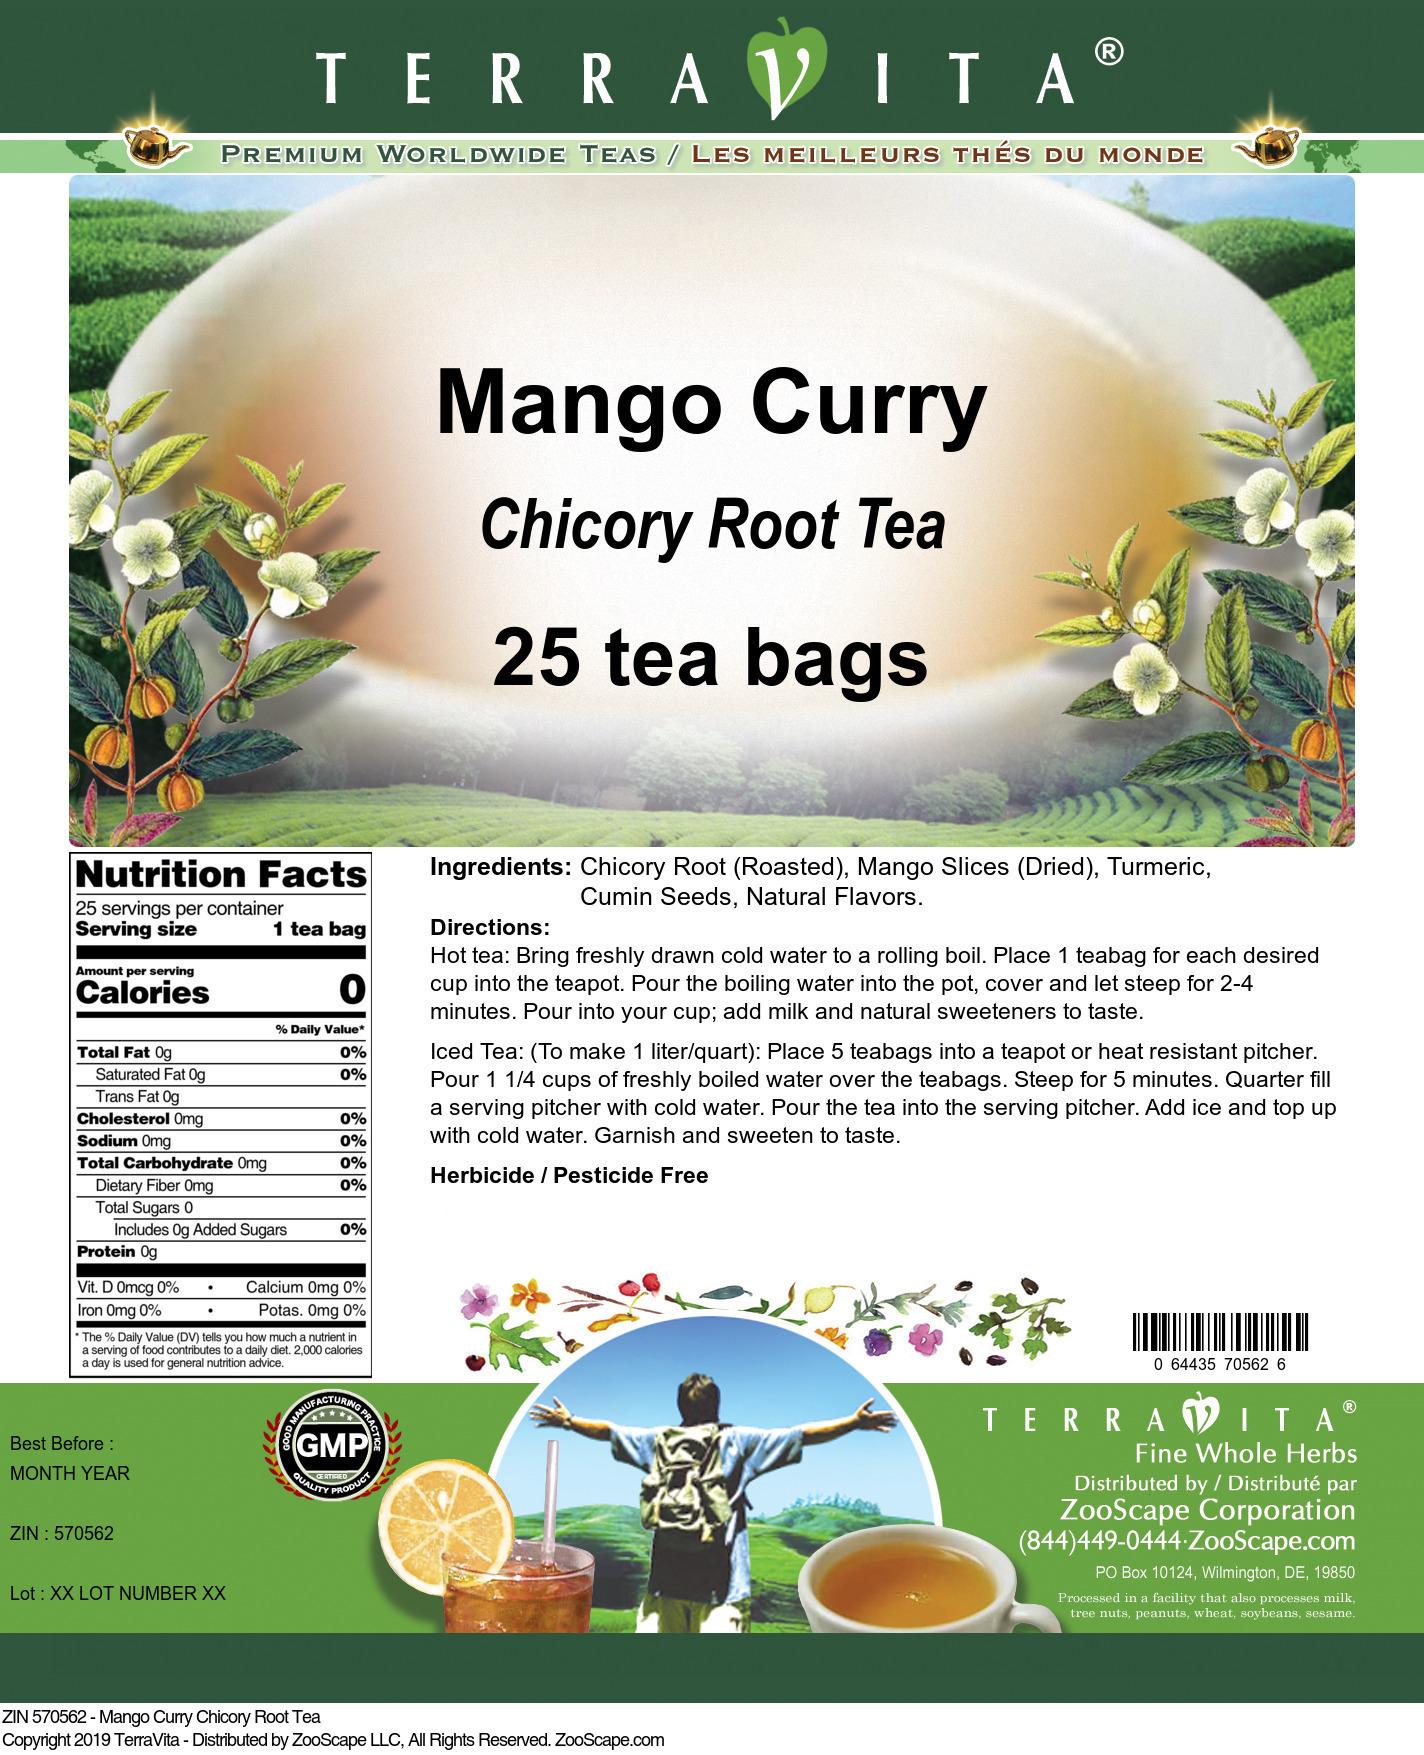 Mango Curry Chicory Root Tea